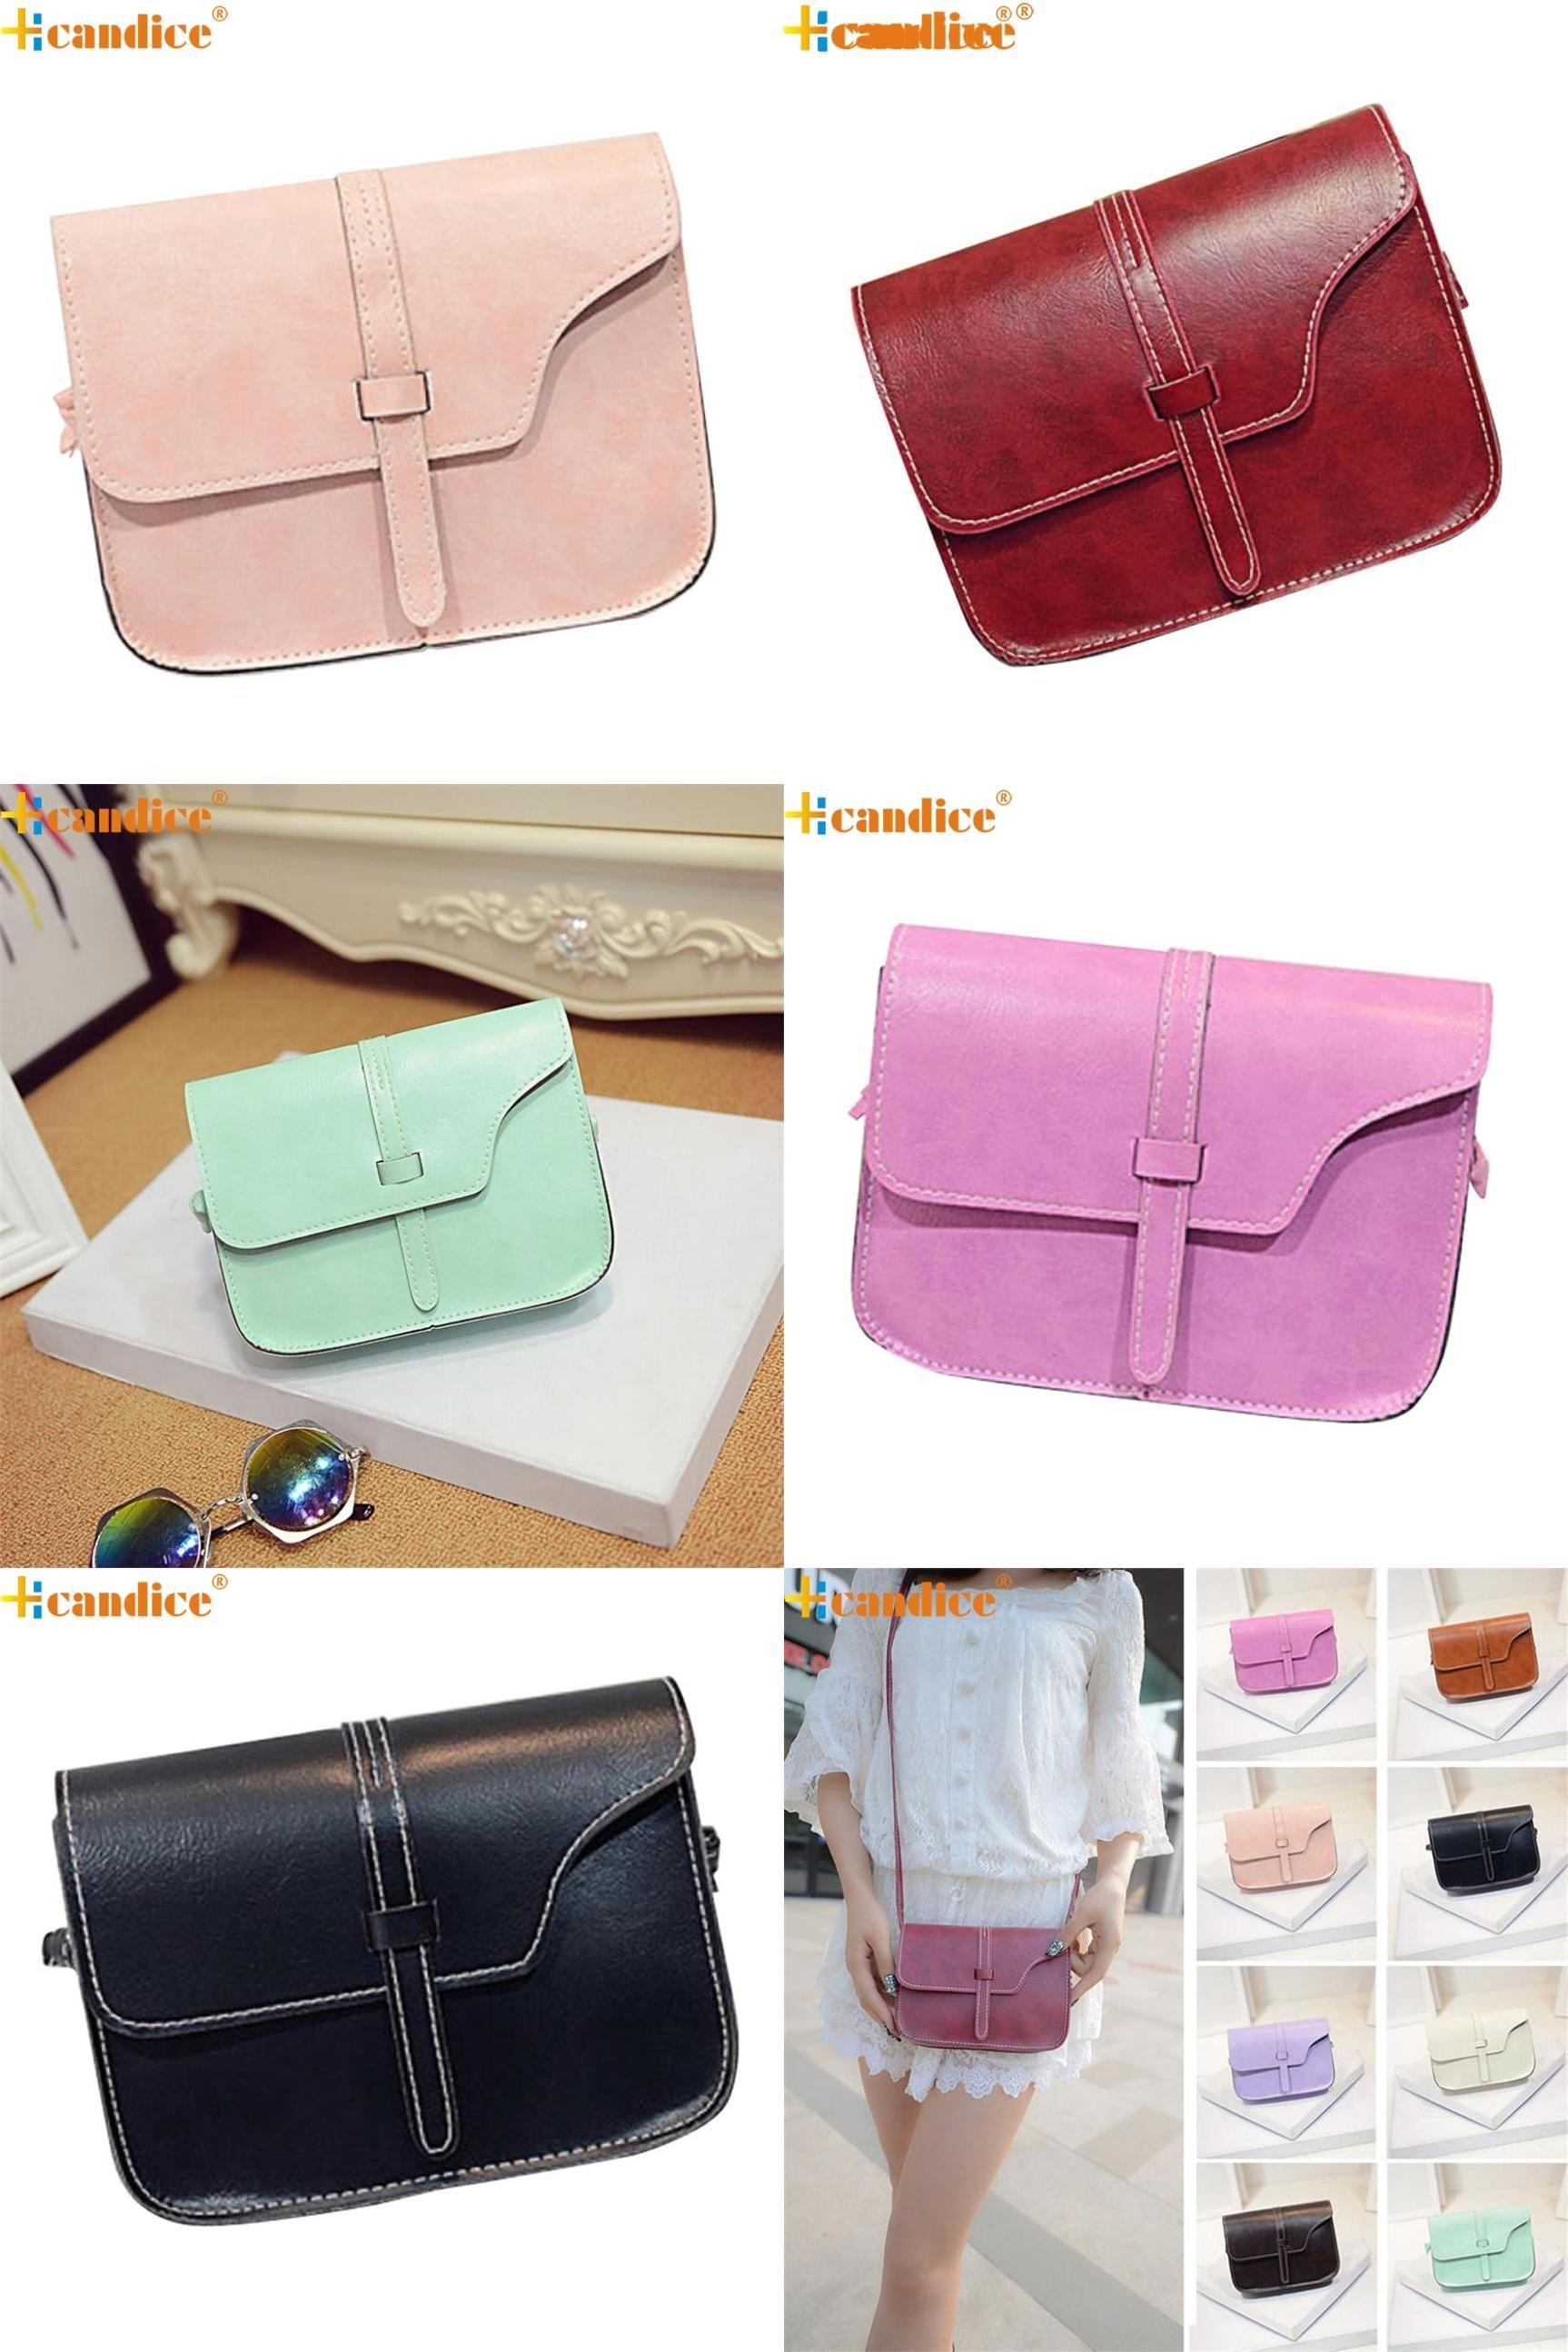 81c0f8038f [Visit to Buy] Hcandice Best Gift New Women Girl Shoulder Bag Faux Leather  Satchel Crossbody Tote Handbag drop ship bea666 #Advertisement